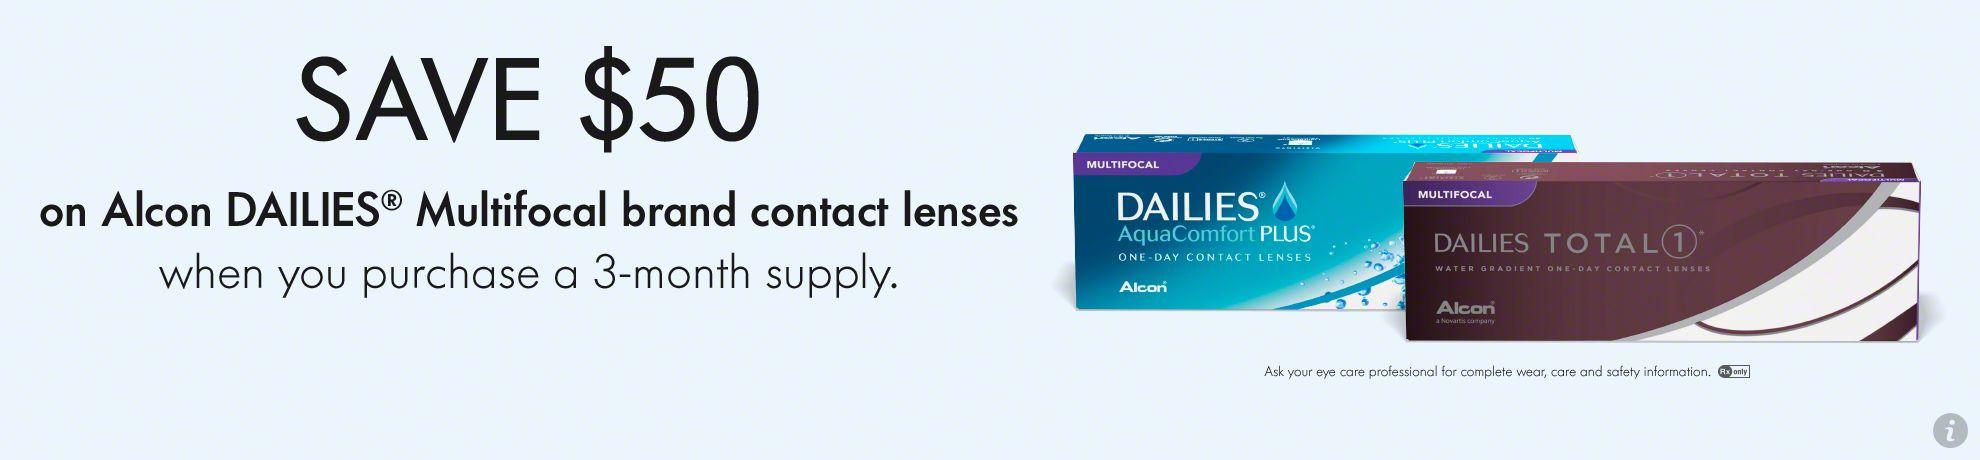 Alcon Dailies Multifocal